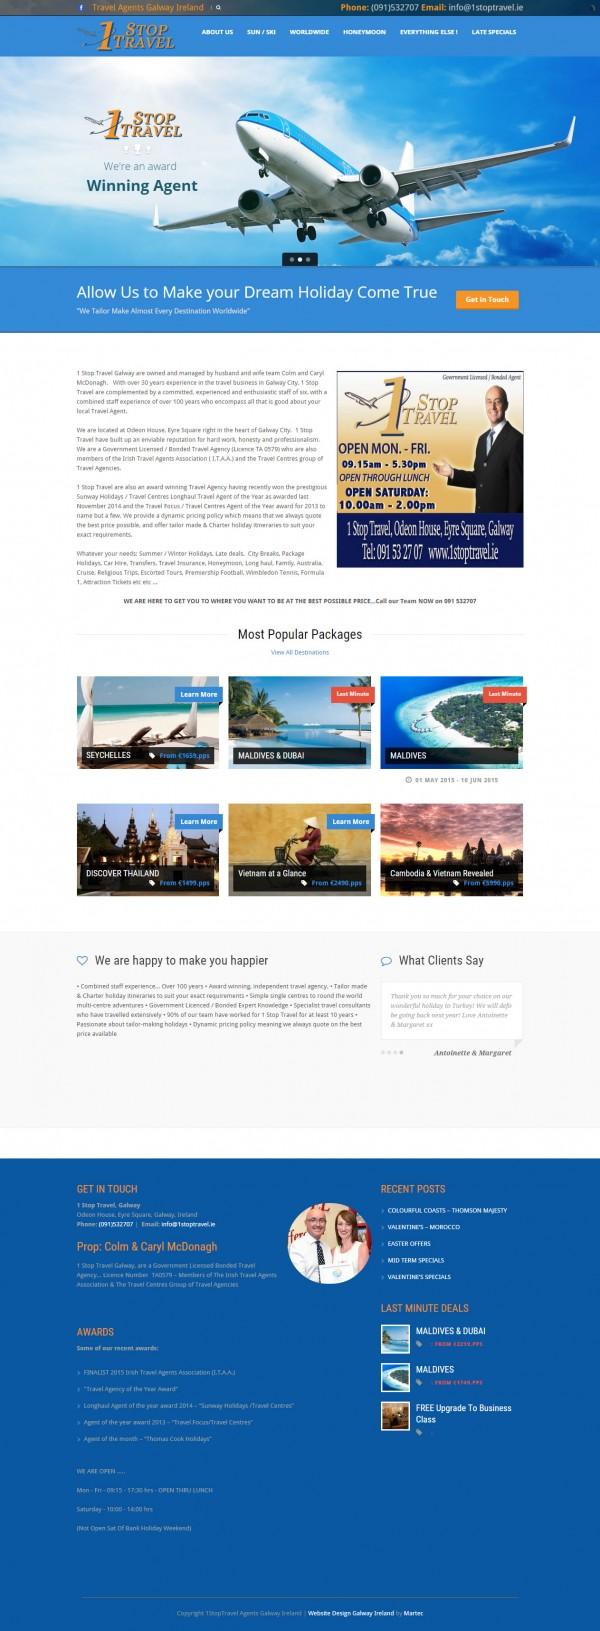 1 Stop Travel Agents Web Design Galway Ireland